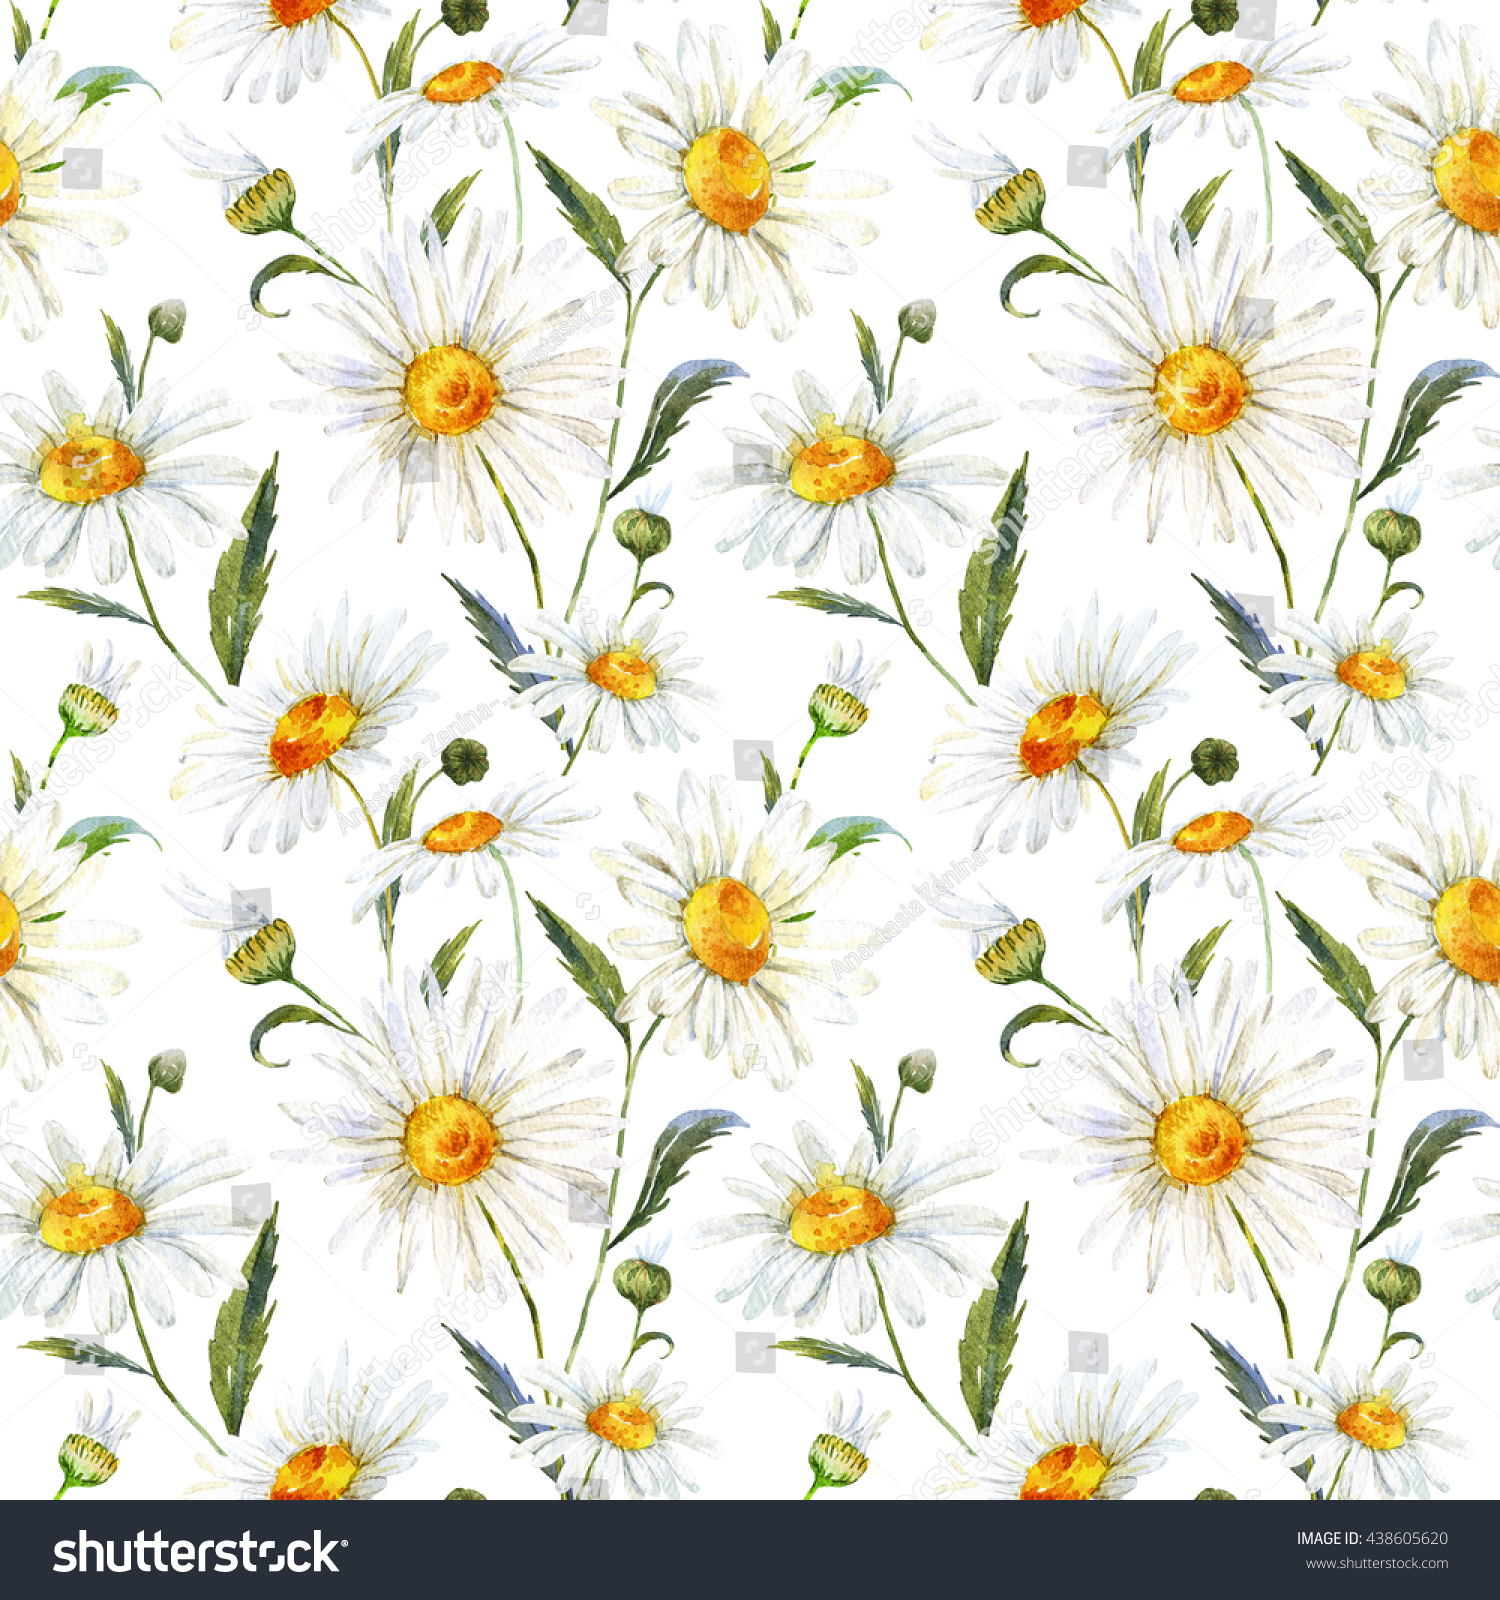 Watercolor floral pattern daisy white gentle stock illustration watercolor floral pattern daisy white gentle chamomile medicinal plant seamless pattern white izmirmasajfo